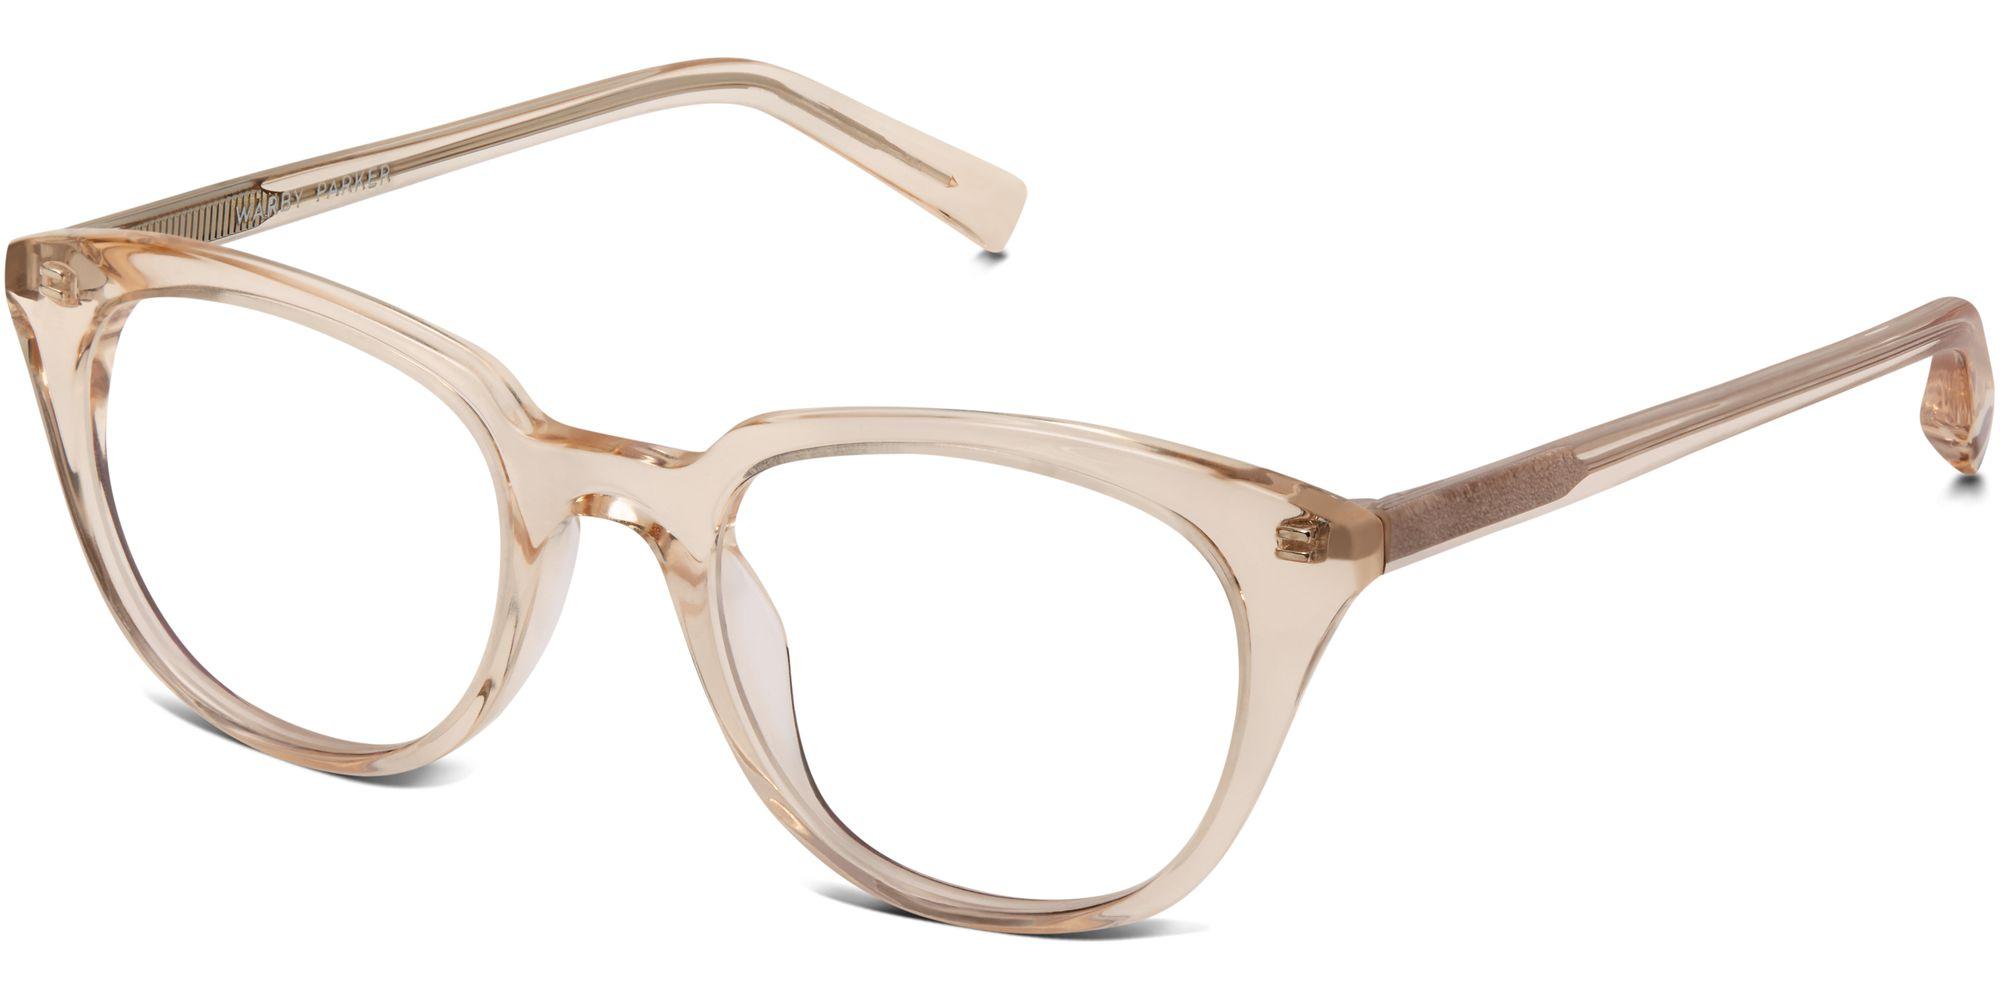 Warby Parker Glasses Pink Grapefruit Chelsea